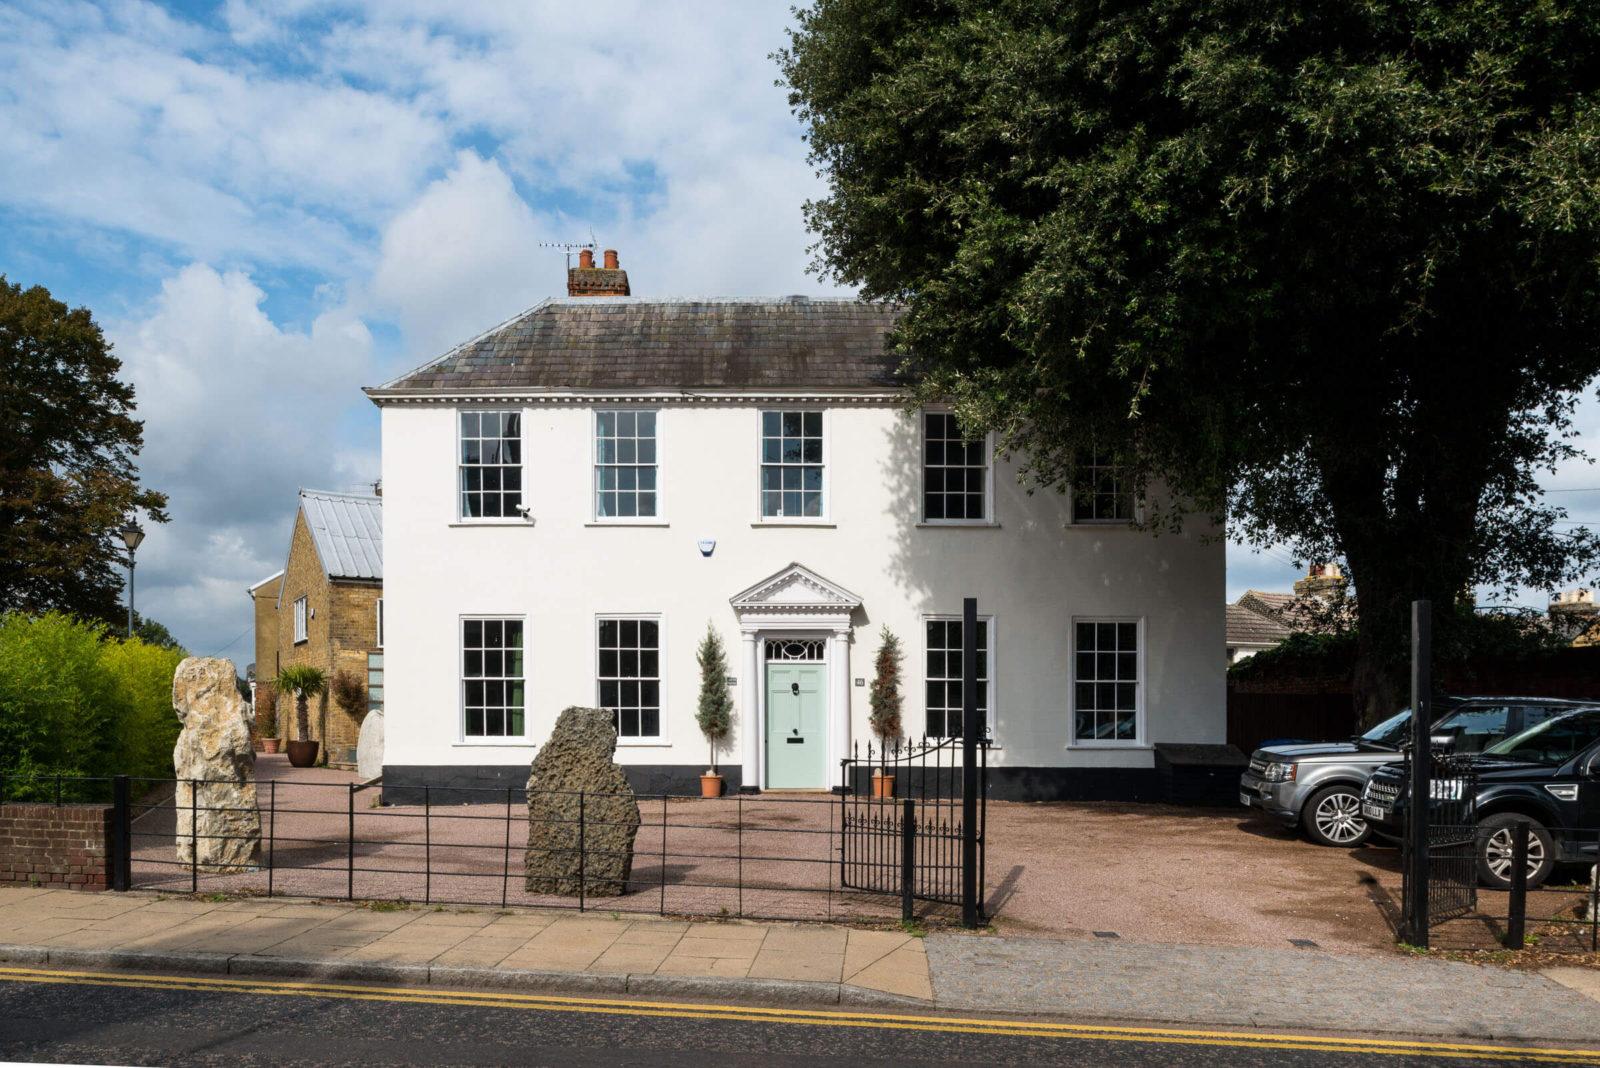 Property To Buy In Faversham